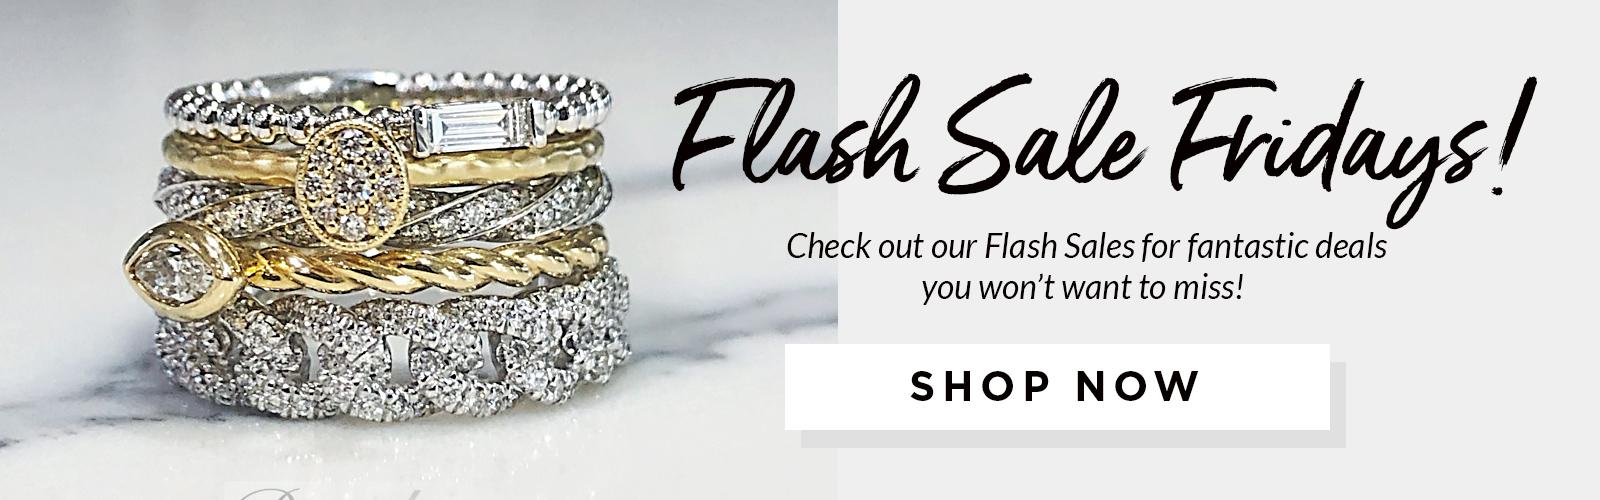 FLASH SALE FRIDAYS! - Bentley Diamond